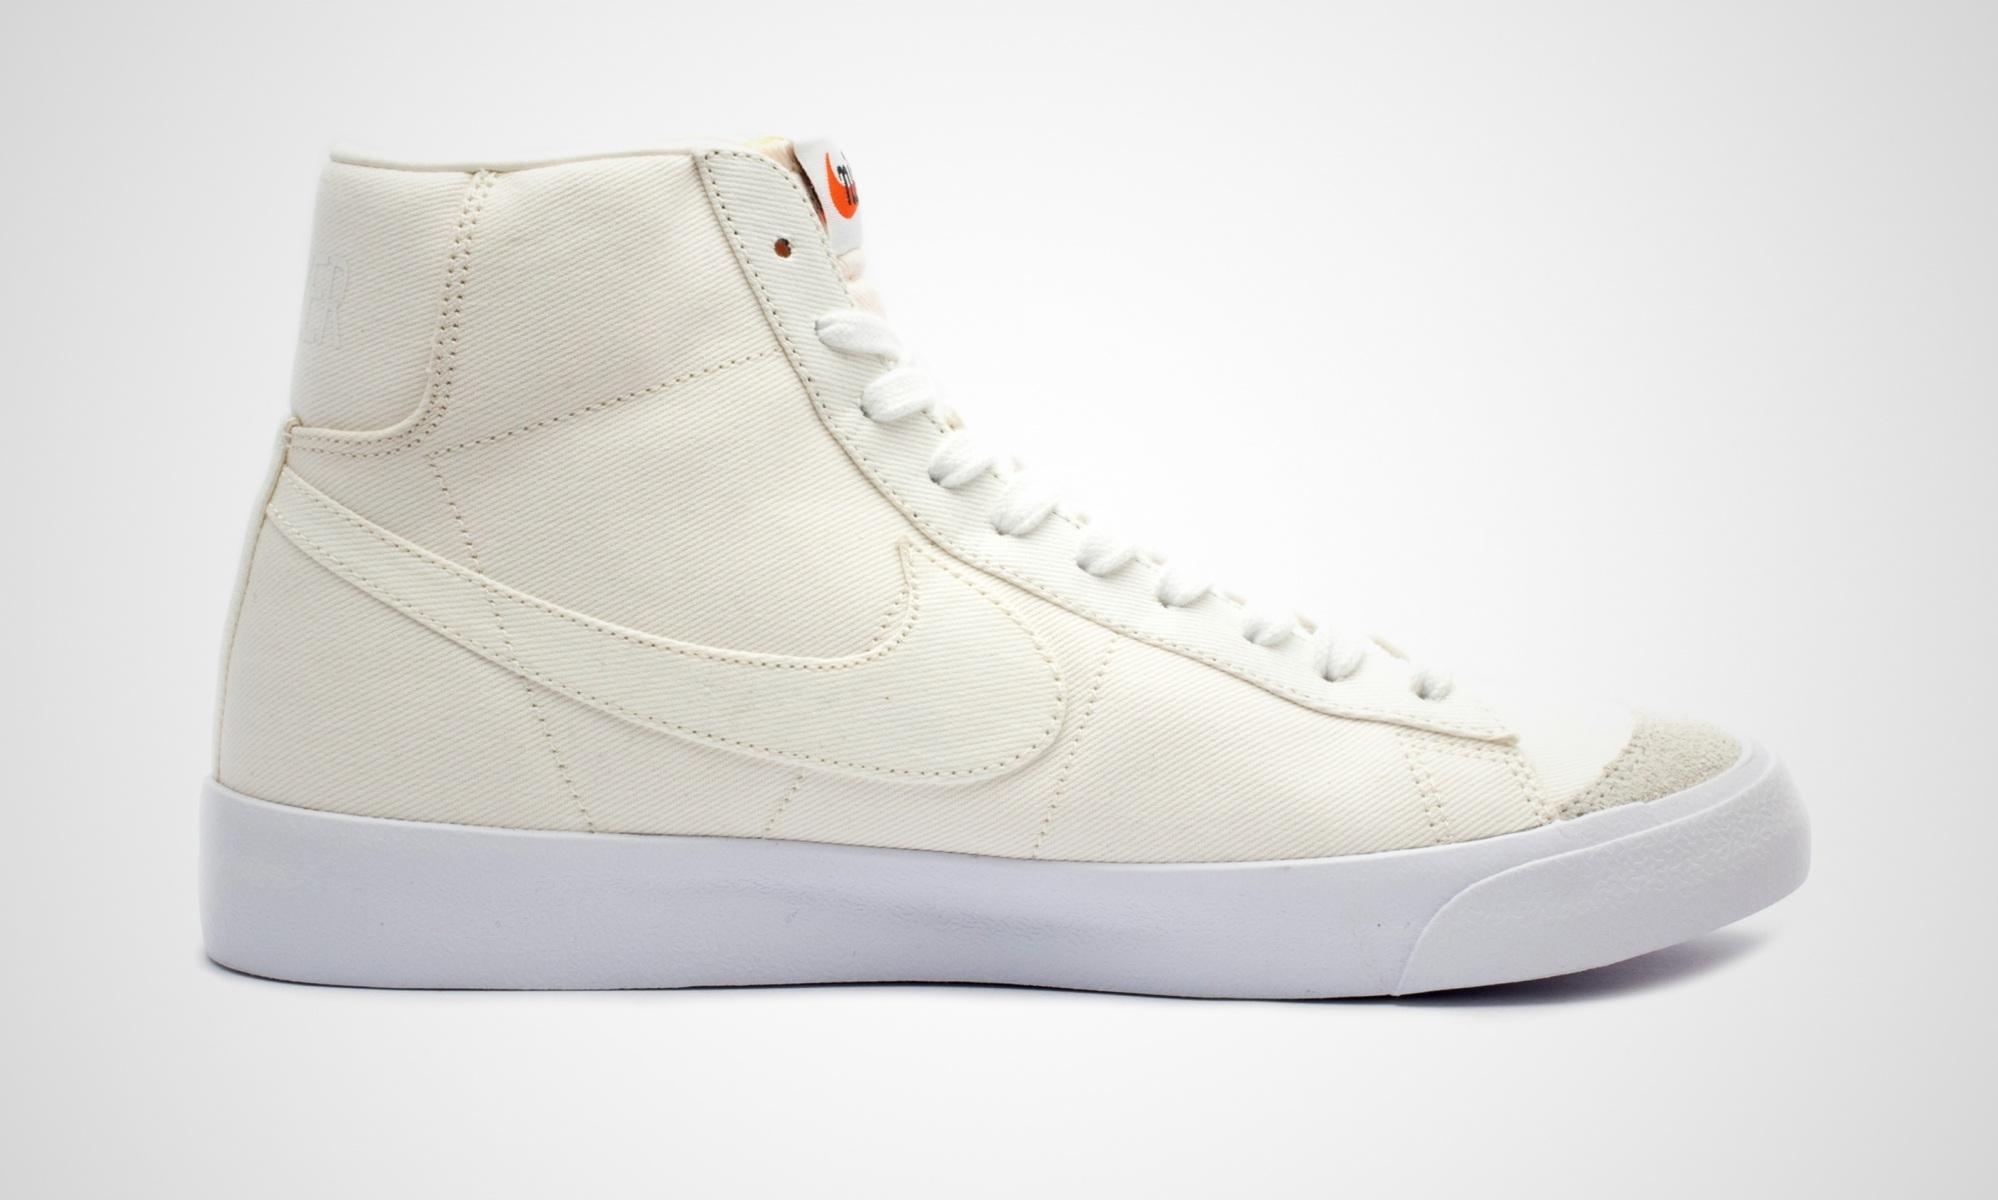 Nike Blazer Mid 77 Vintage WE Sail | Dead Stock Sneakerblog